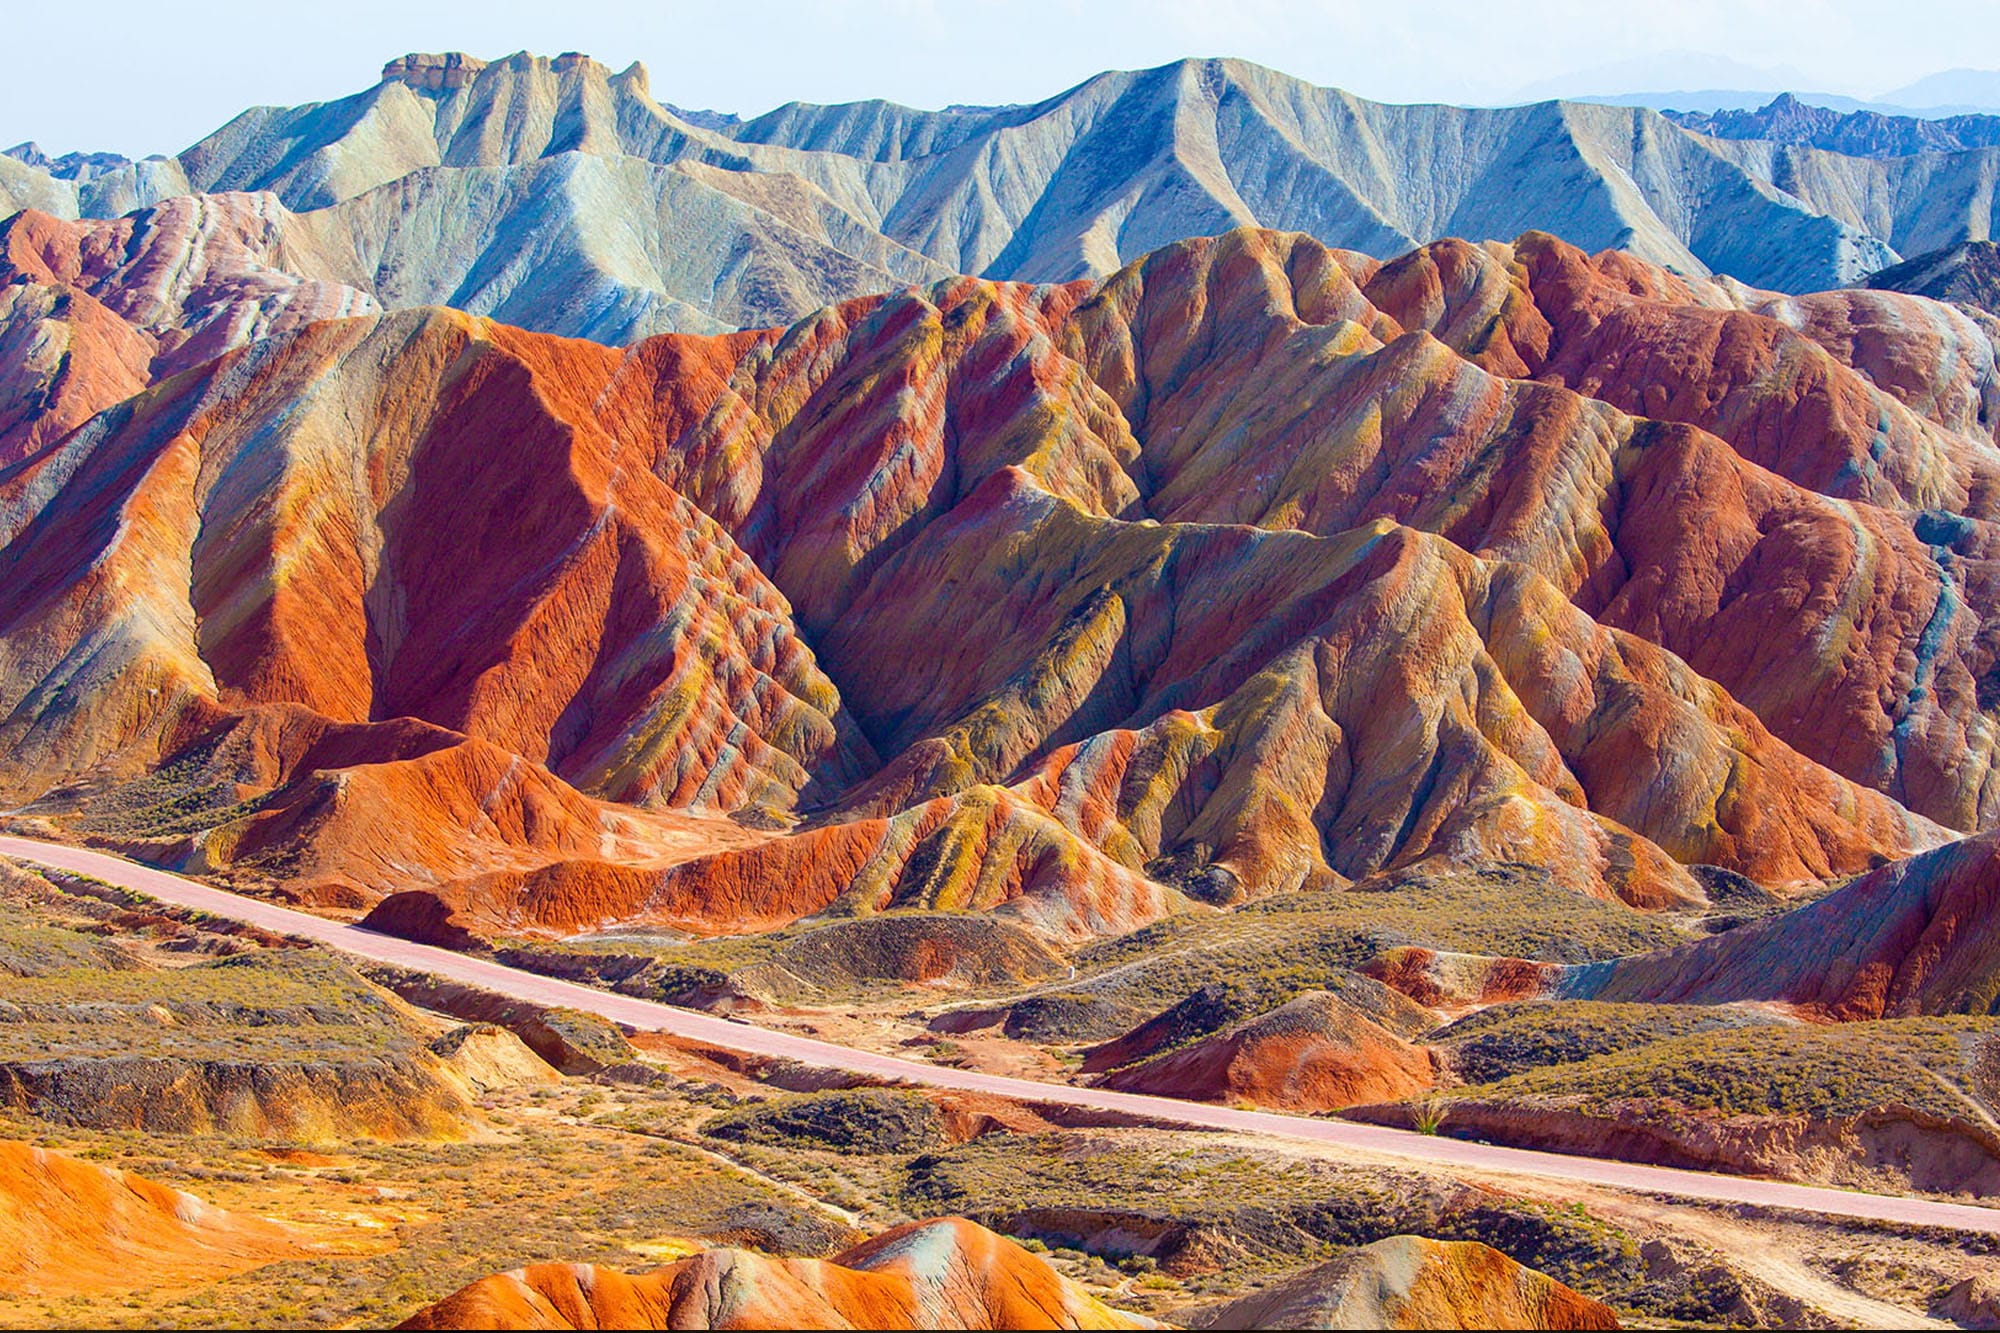 The Silk Road path